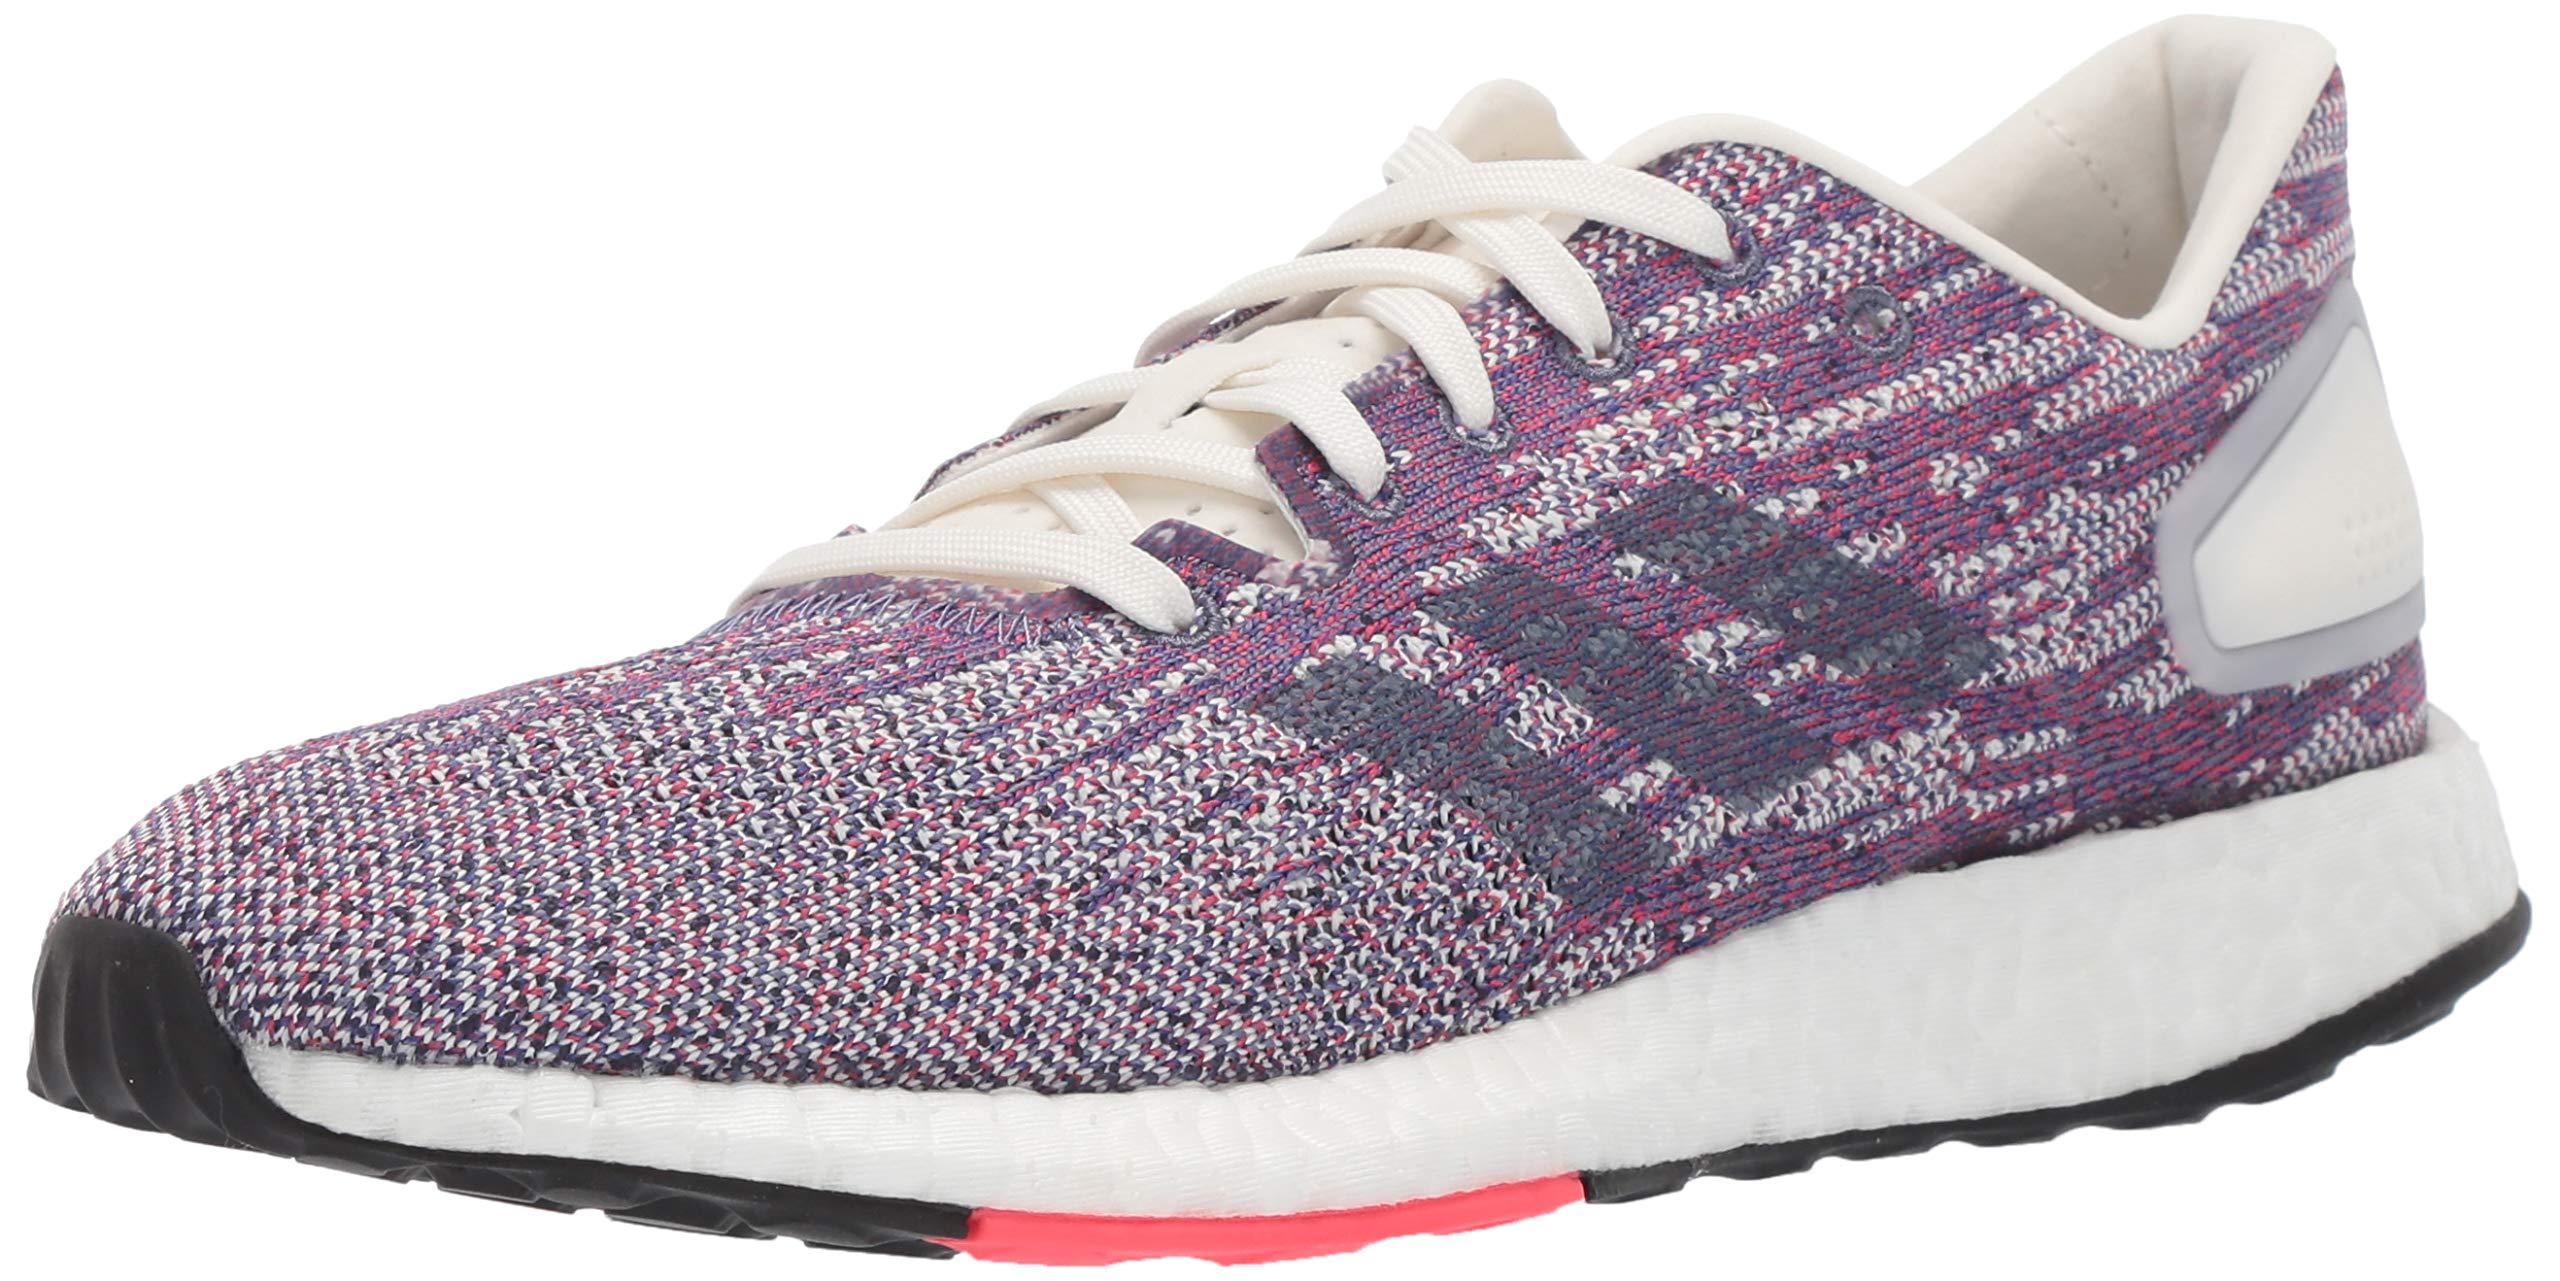 adidas Women's Pureboost DPR Running Shoes, Cloud White/raw Indigo/Shock red, 5.5 M US